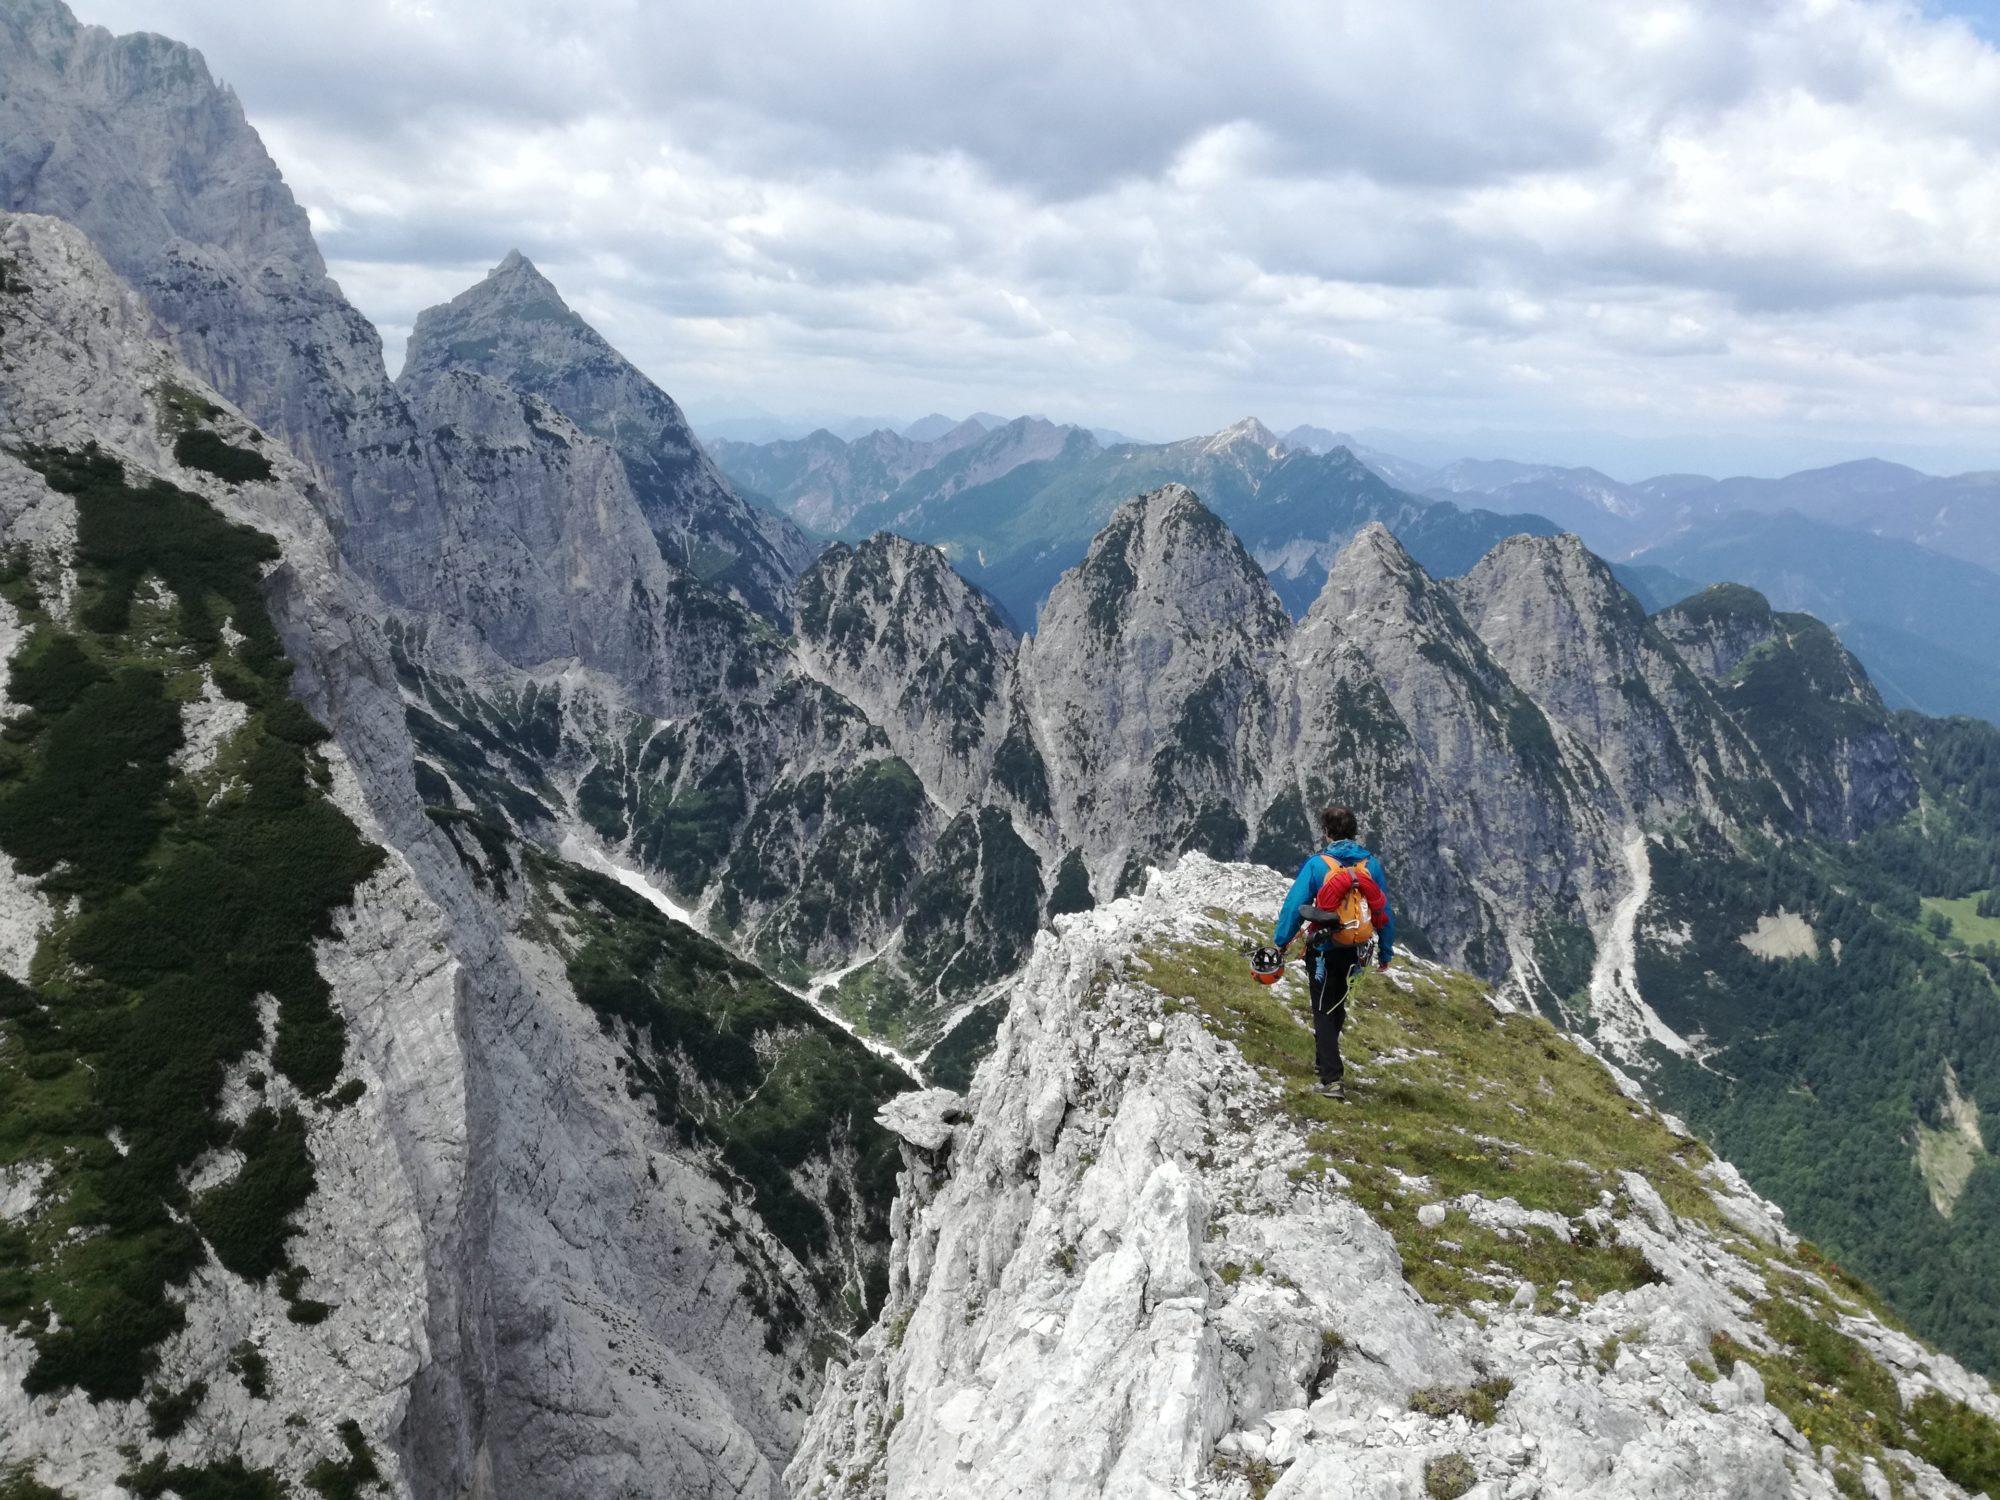 Alpinistični odsek Nova Gorica